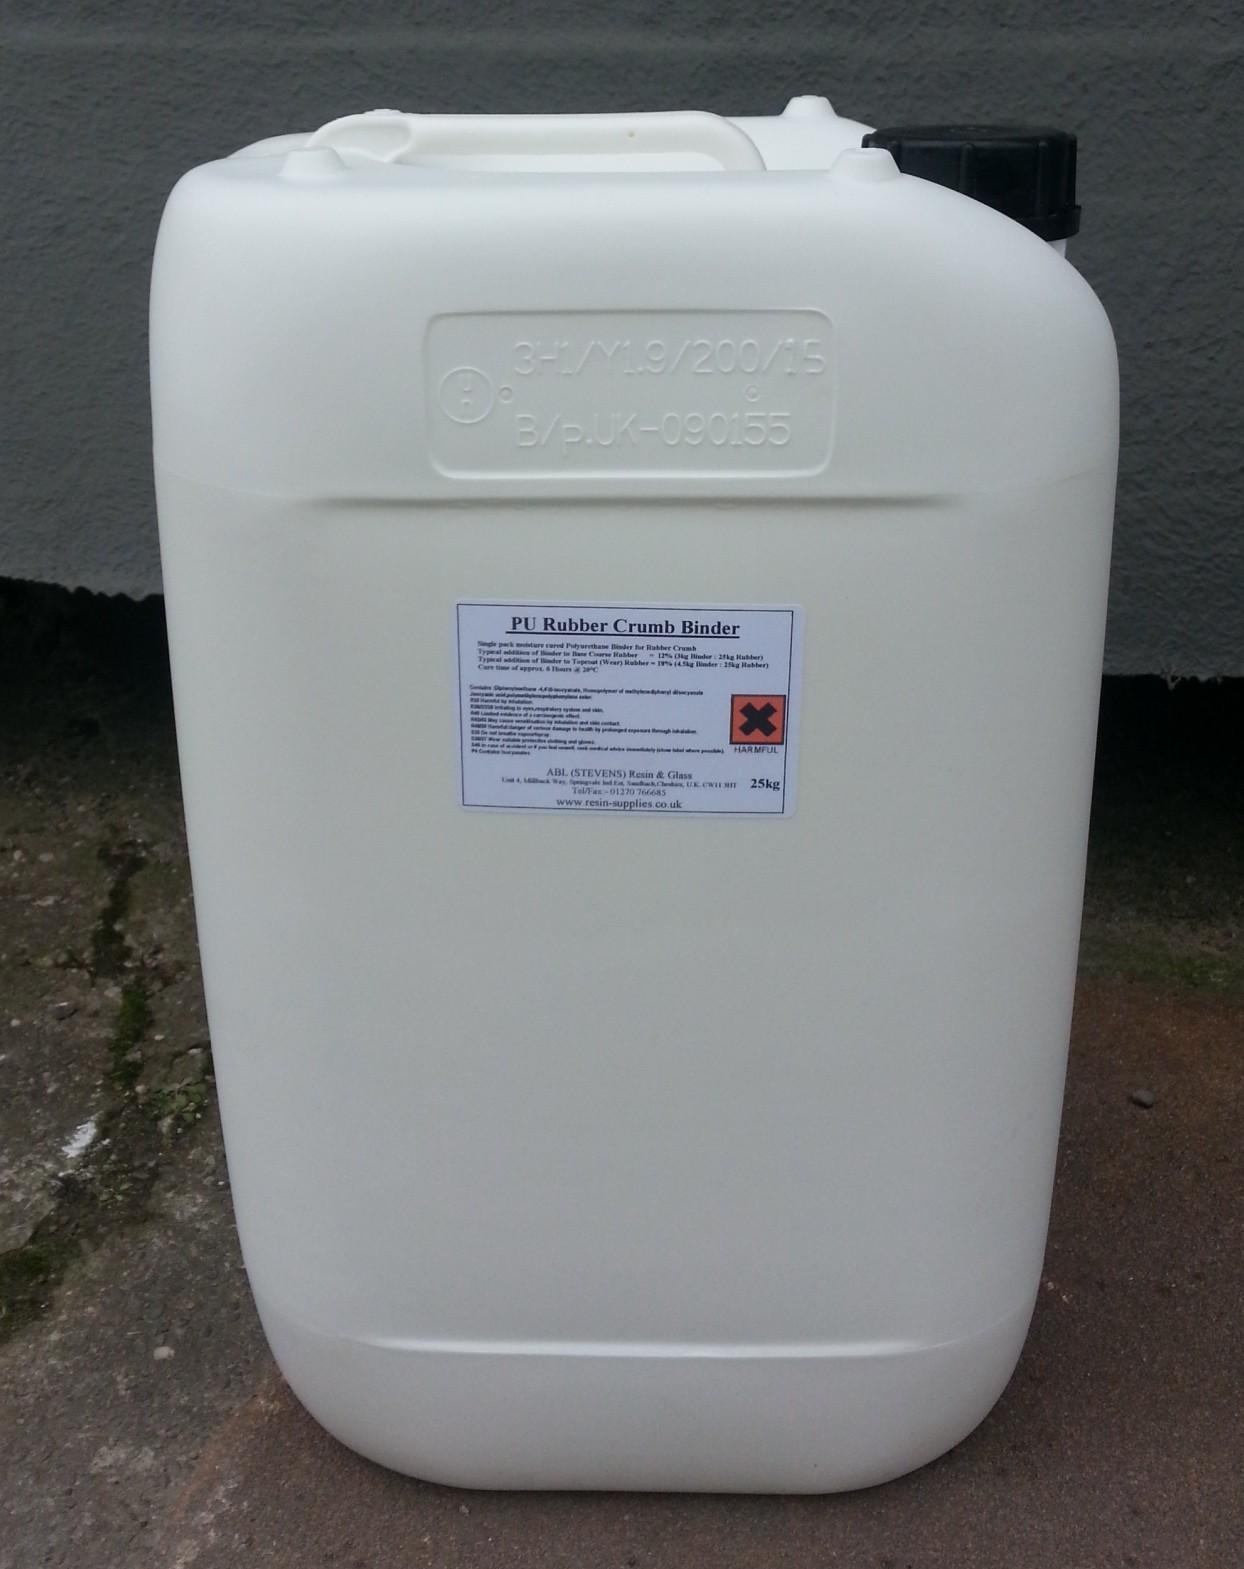 ABL Stevens - fibreglass repair, resin suppliers, polymer suppliers